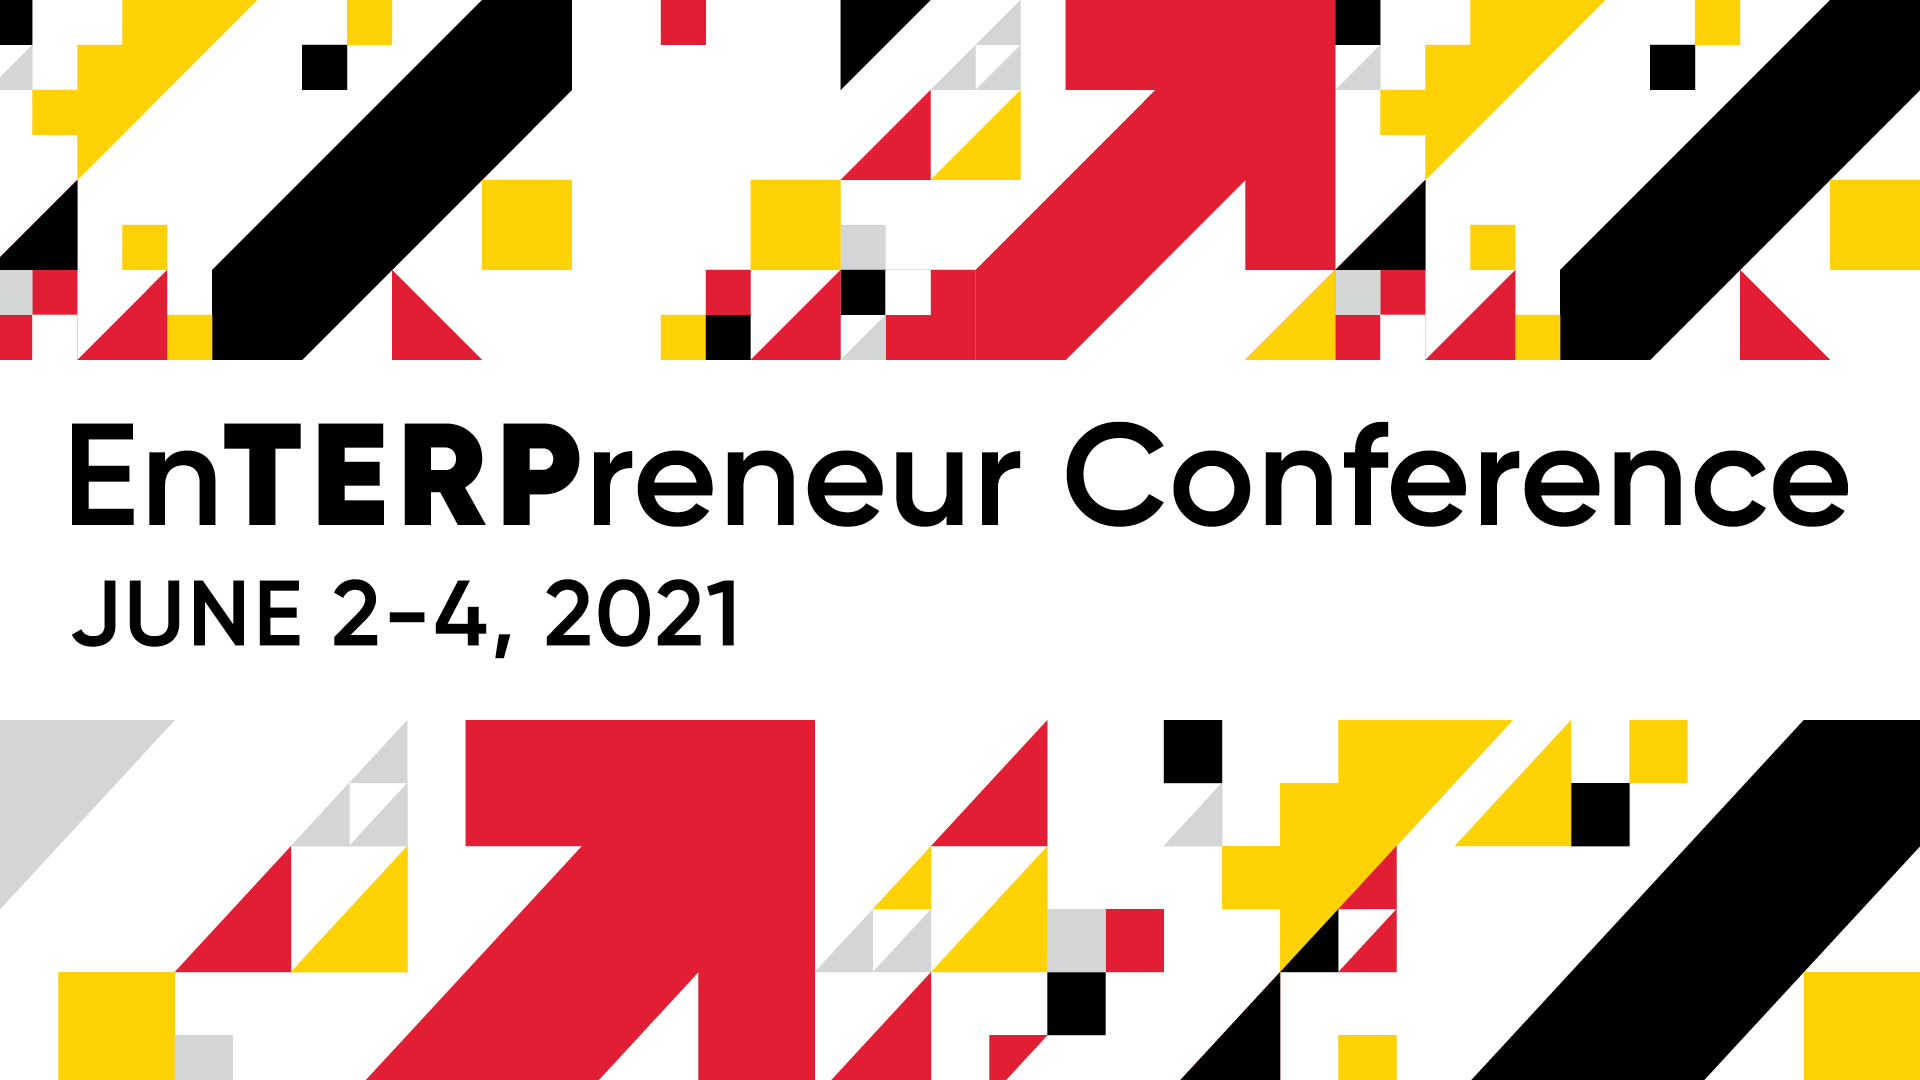 EnTERPreneur Conference | June 2-4, 2021